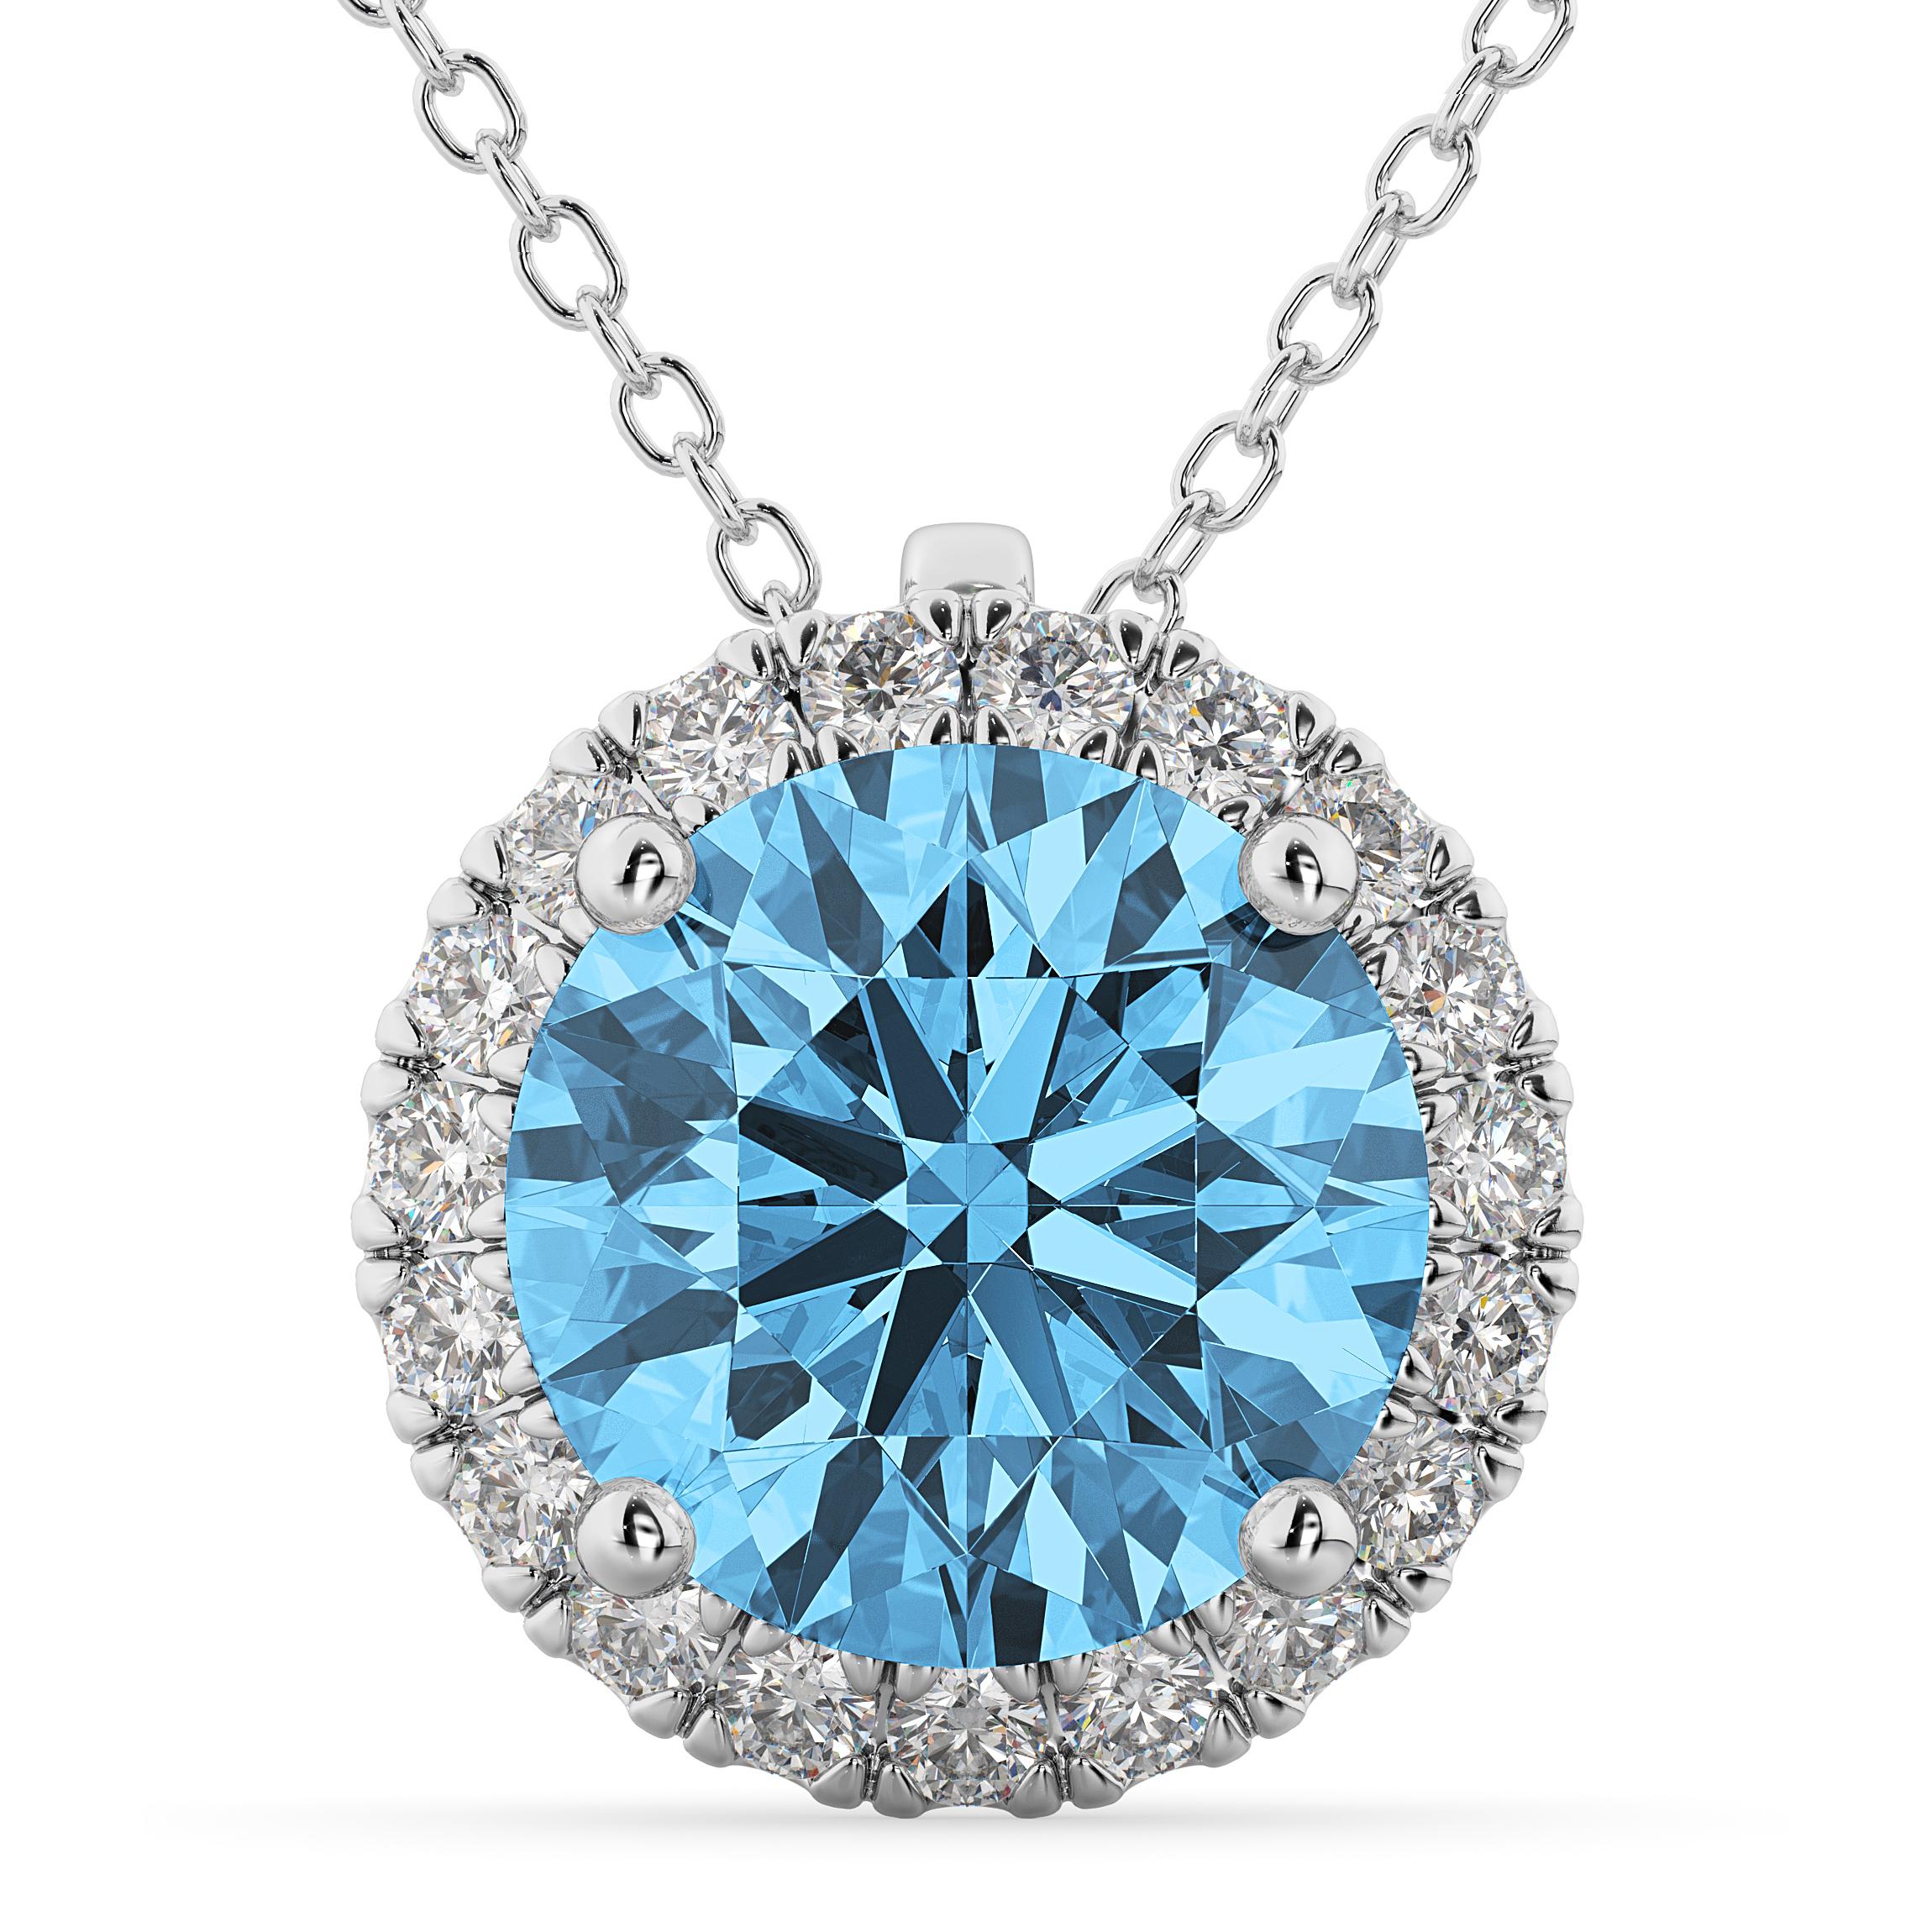 Halo Round Blue Topaz Amp Diamond Pendant Necklace 14k White